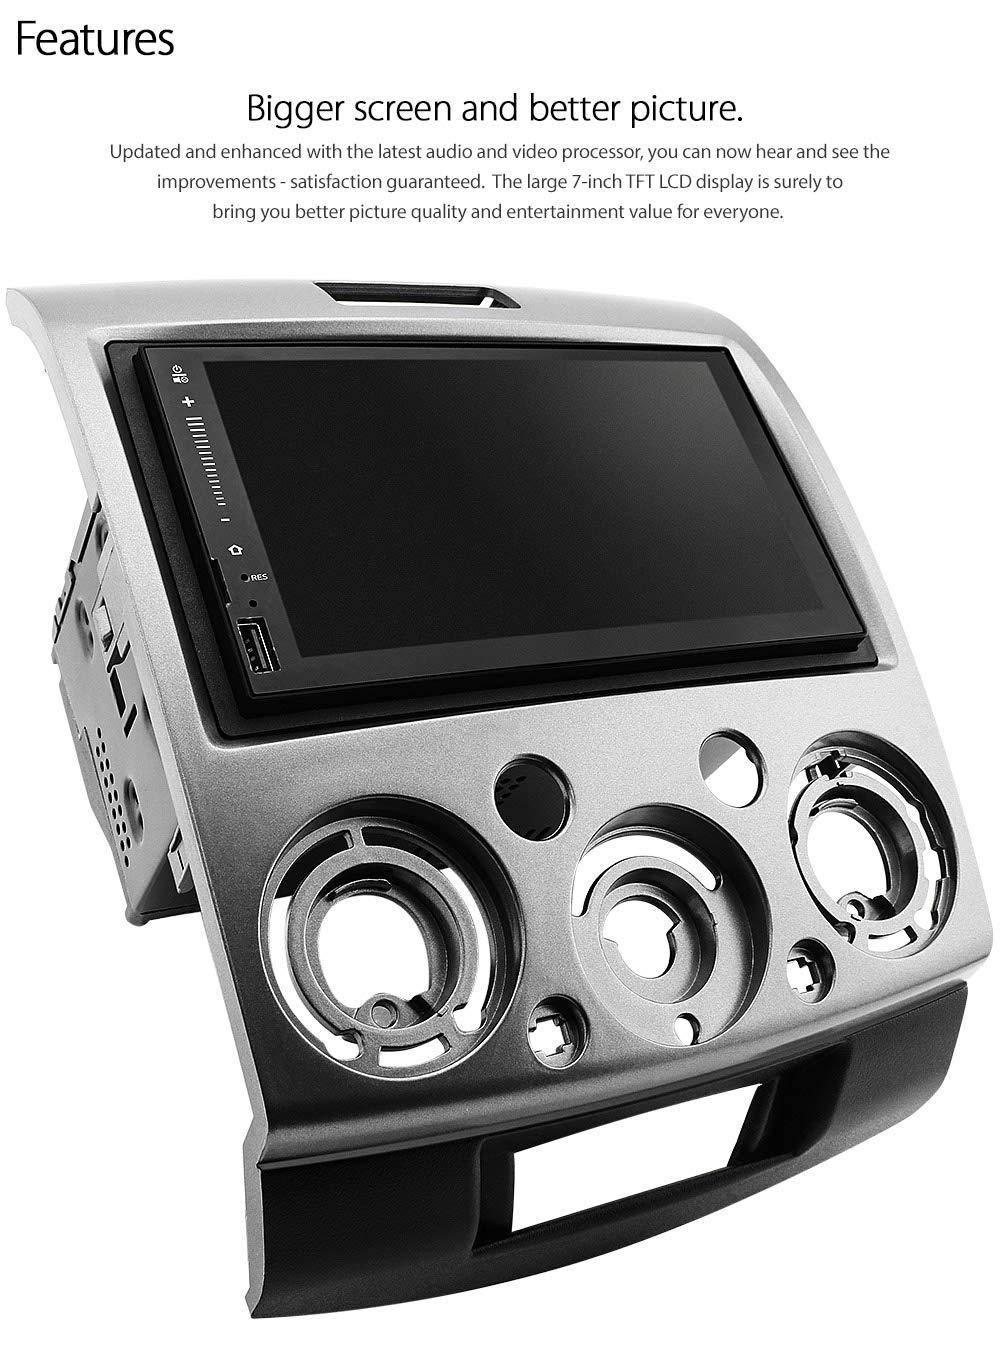 tunez 7 pulgadas Android 2 DIN Reproductor de pantalla t/áctil para Ranger PJ PK Coche Reproductor de MP3 USB Din Est/éreo Doble Din Unidad de radio est/éreo Unidad principal MP4 GPS